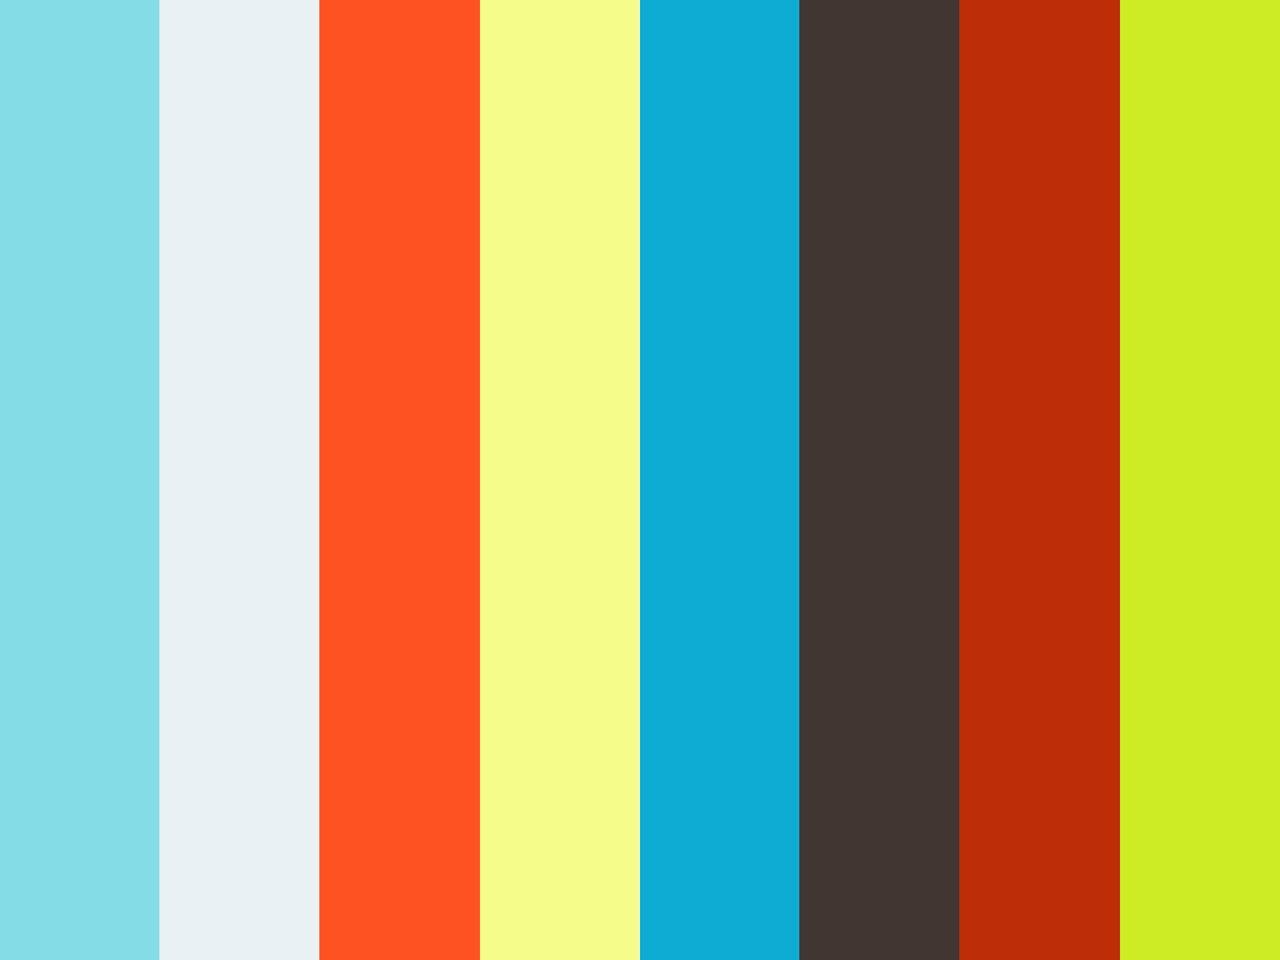 4 Oct 2017 – Erev Sukkot 5778 [3/3]